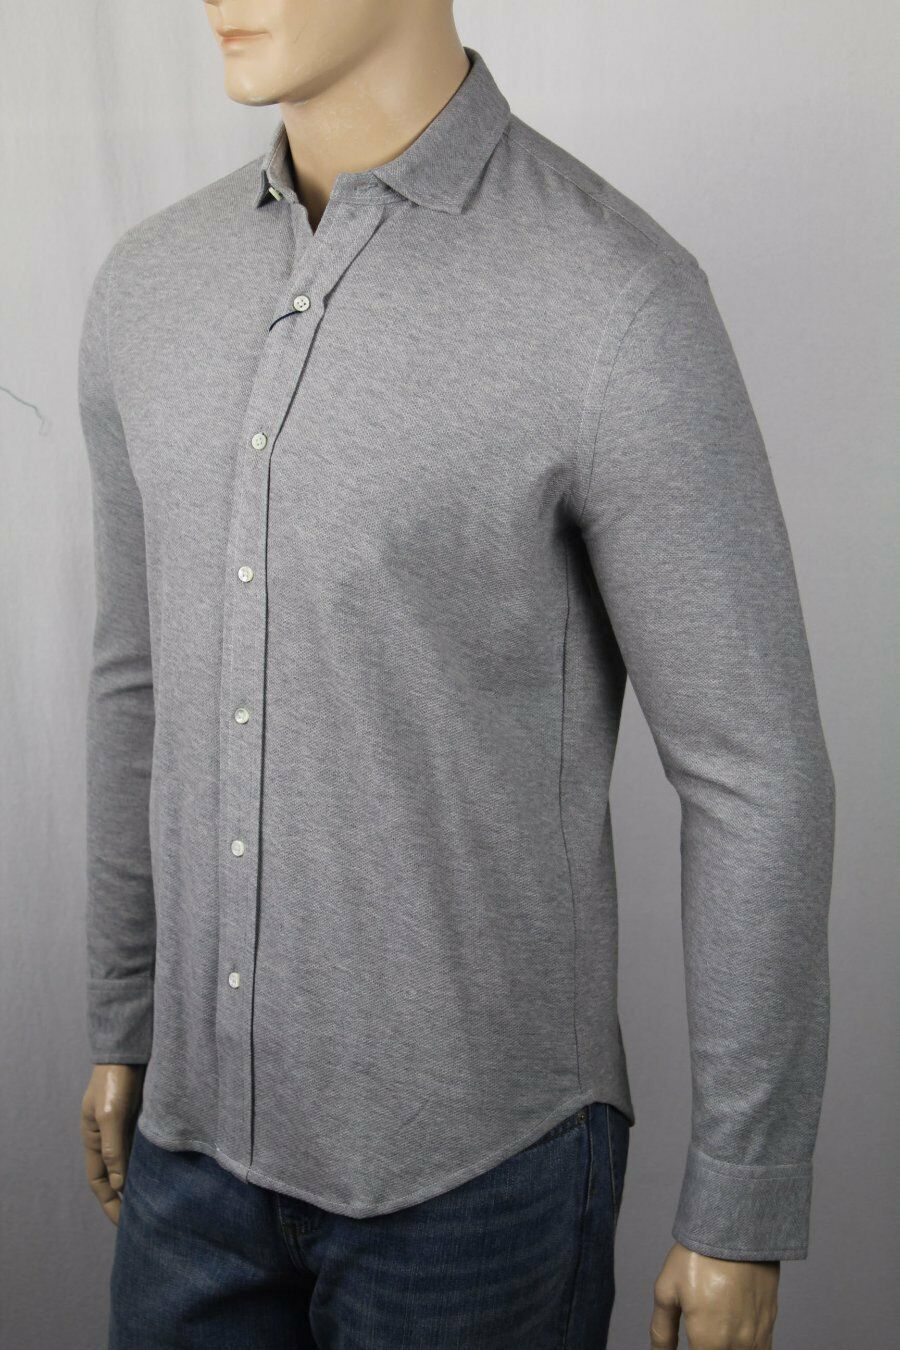 Ralph Lauren Grey Cotton Mesh Polo Button Up Shirt Classic Fit NWT